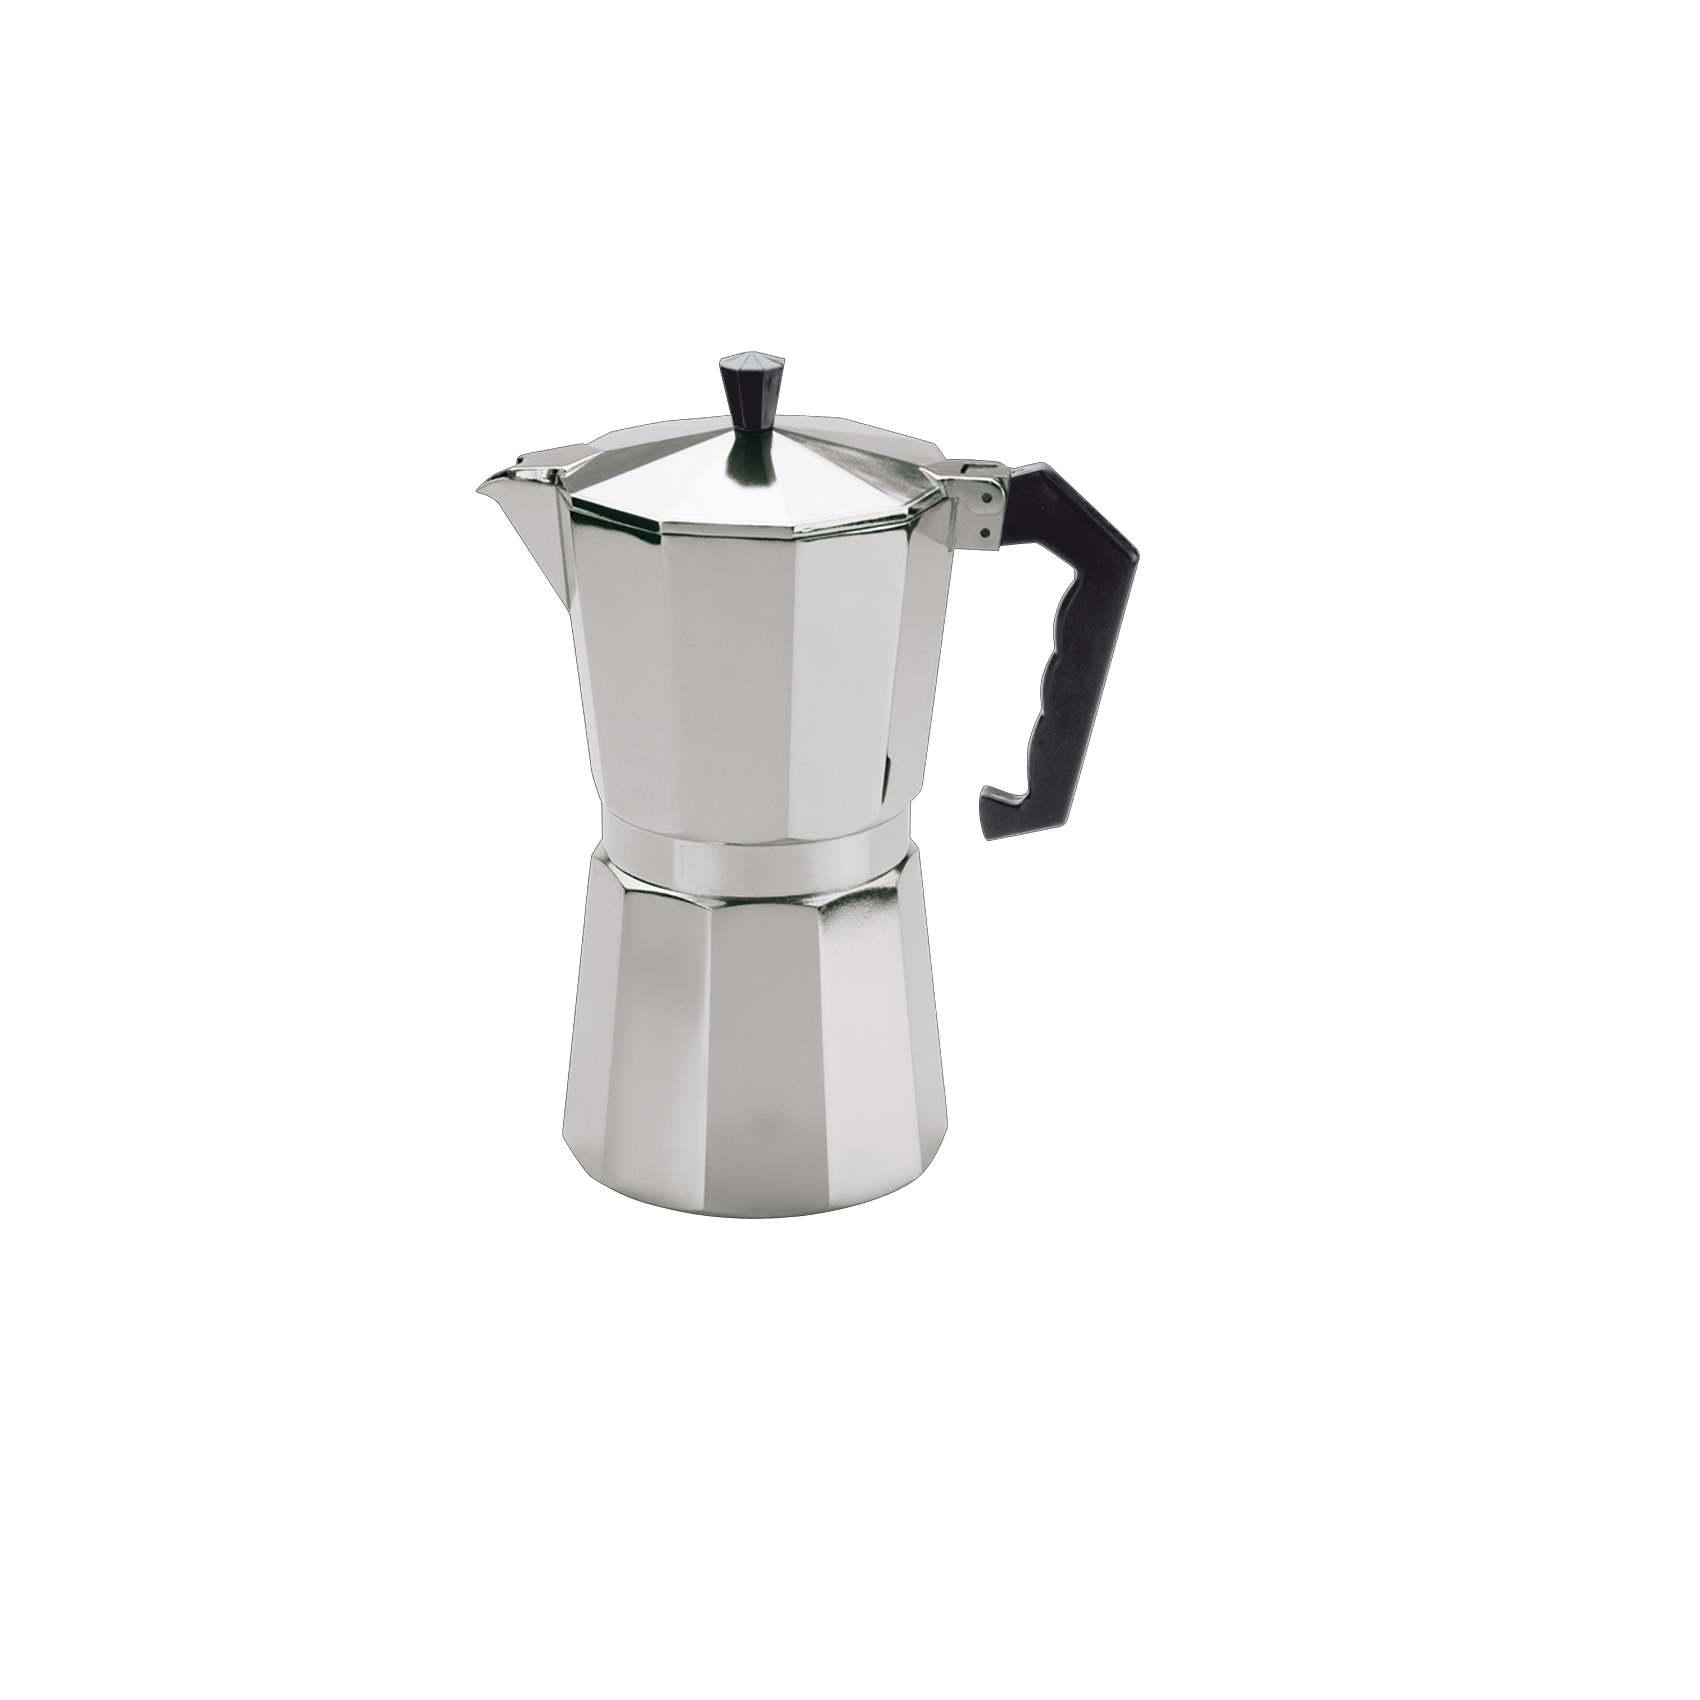 cilio espressokocher classico f r 3 tassen aus aluminium espressokocher dichtungsringe. Black Bedroom Furniture Sets. Home Design Ideas